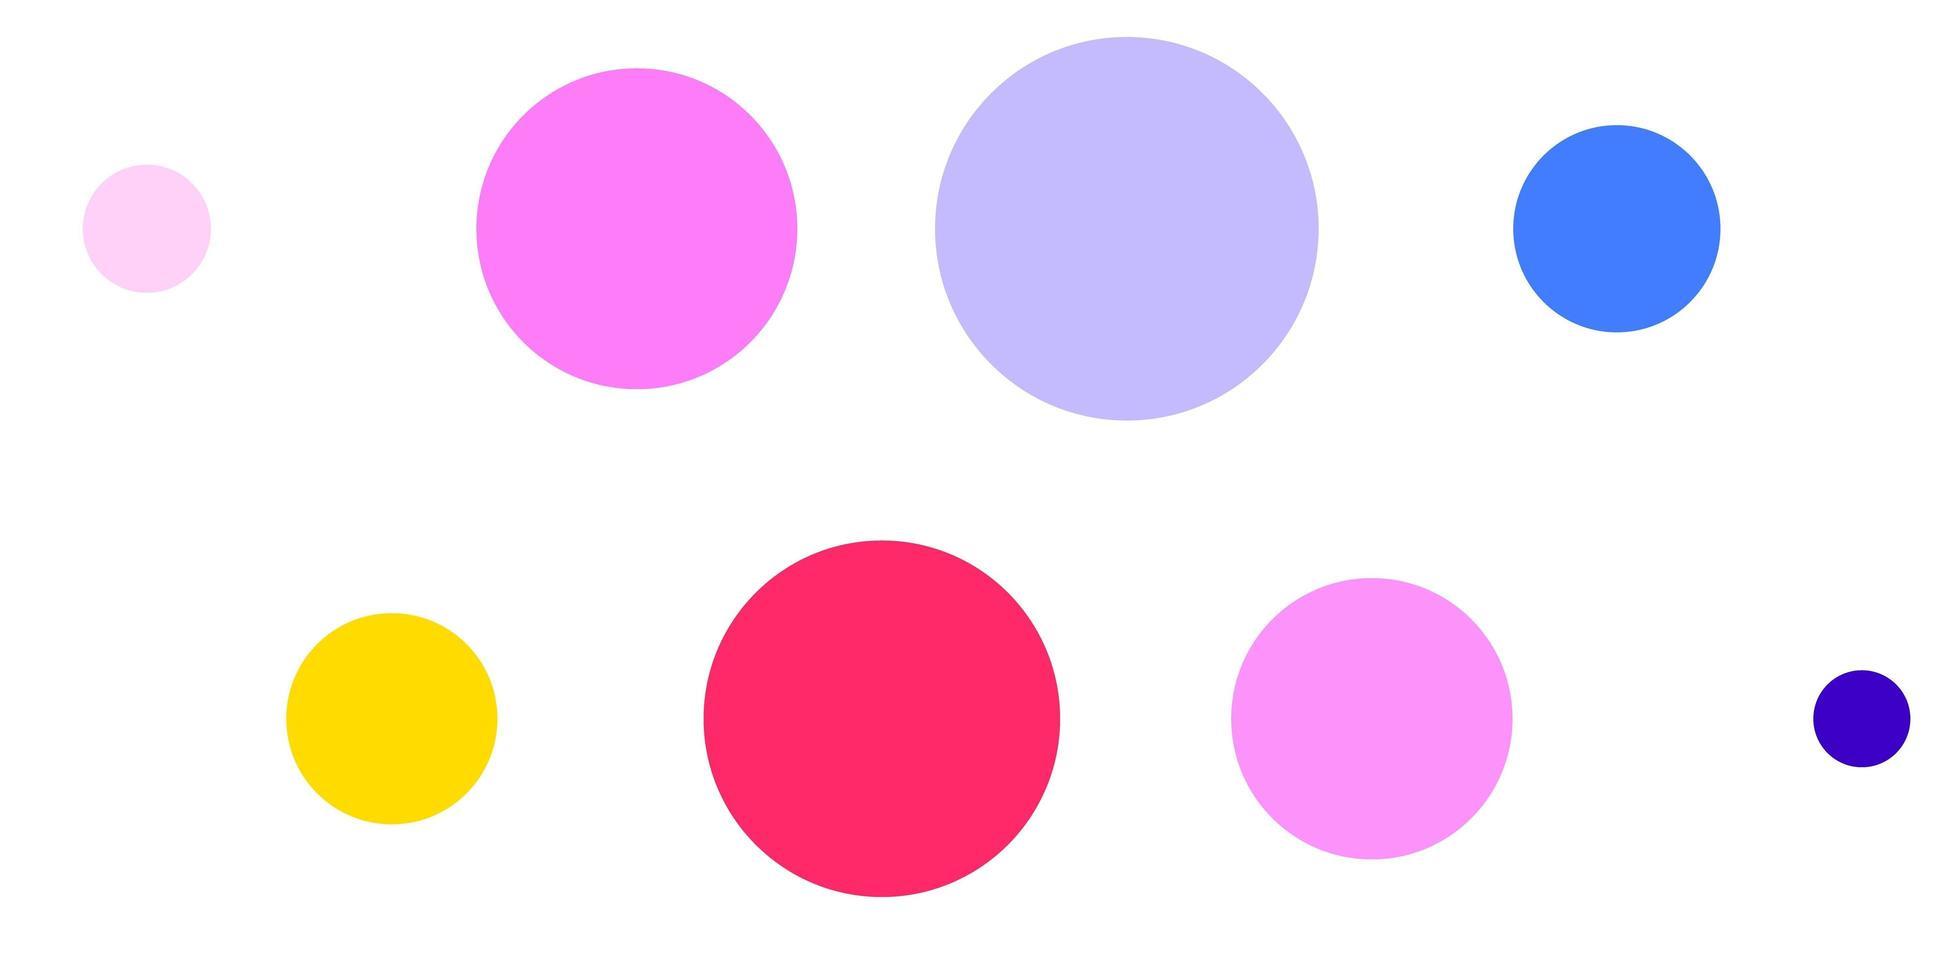 fundo vector rosa claro, azul com bolhas.